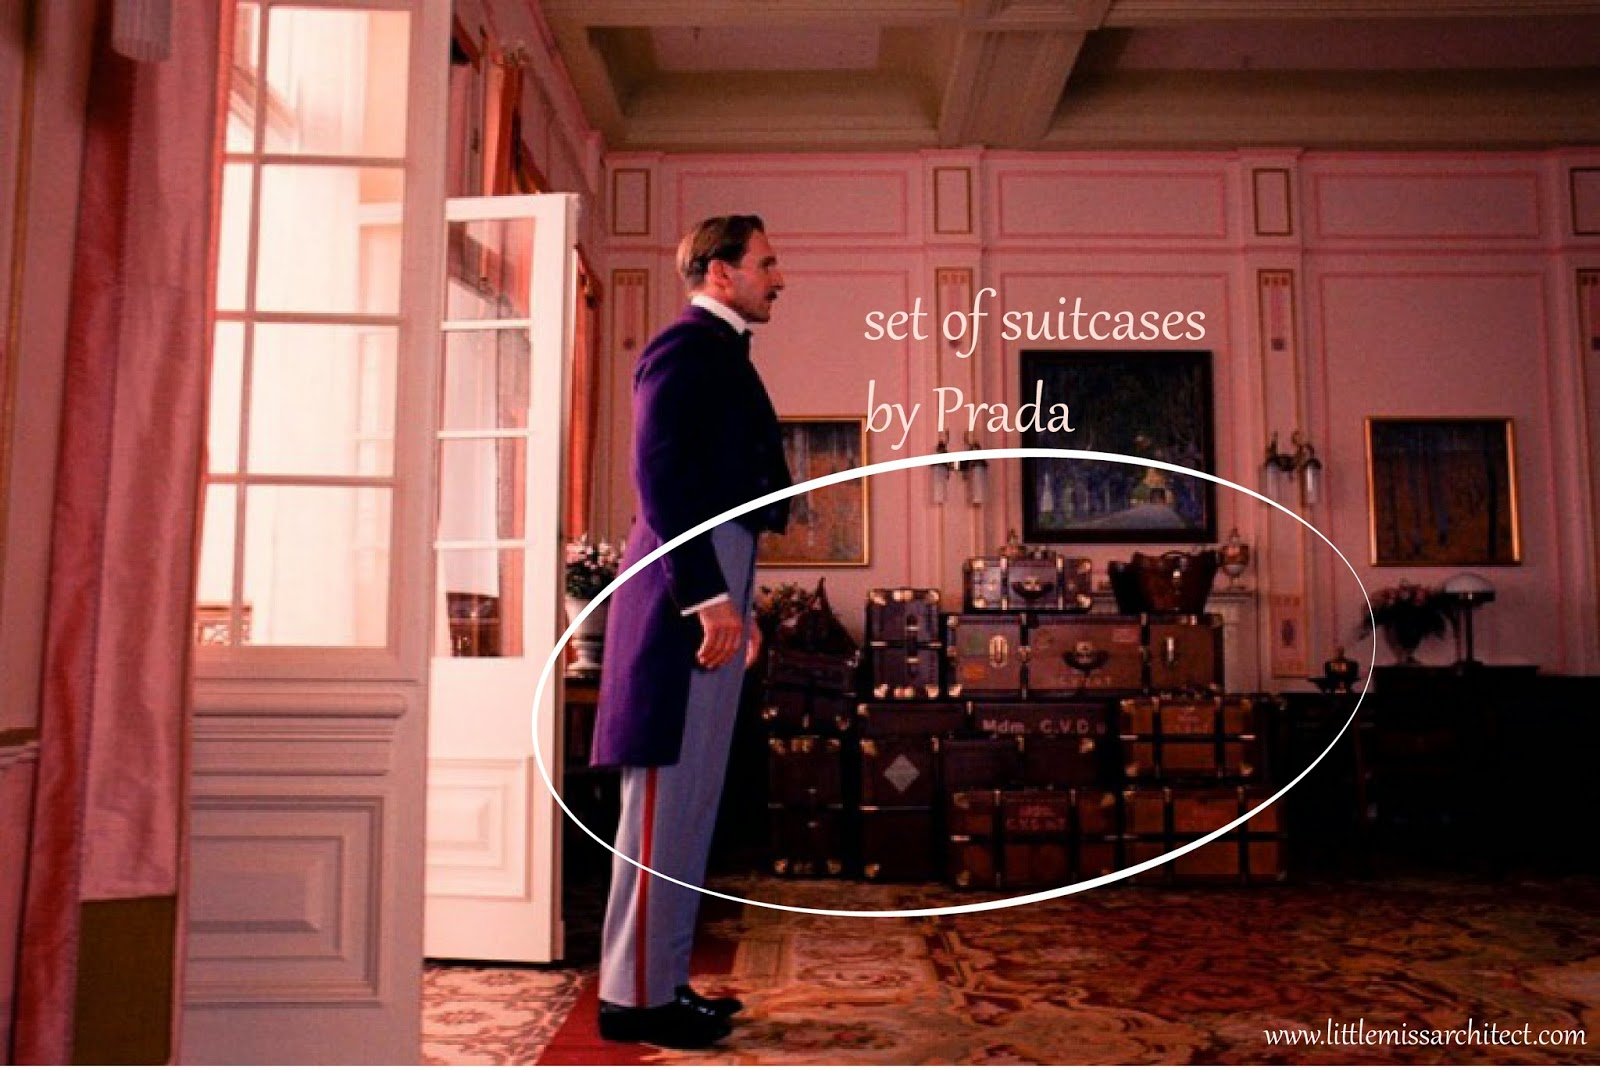 Grand Budapest Hotel, Prada suitcases. set design